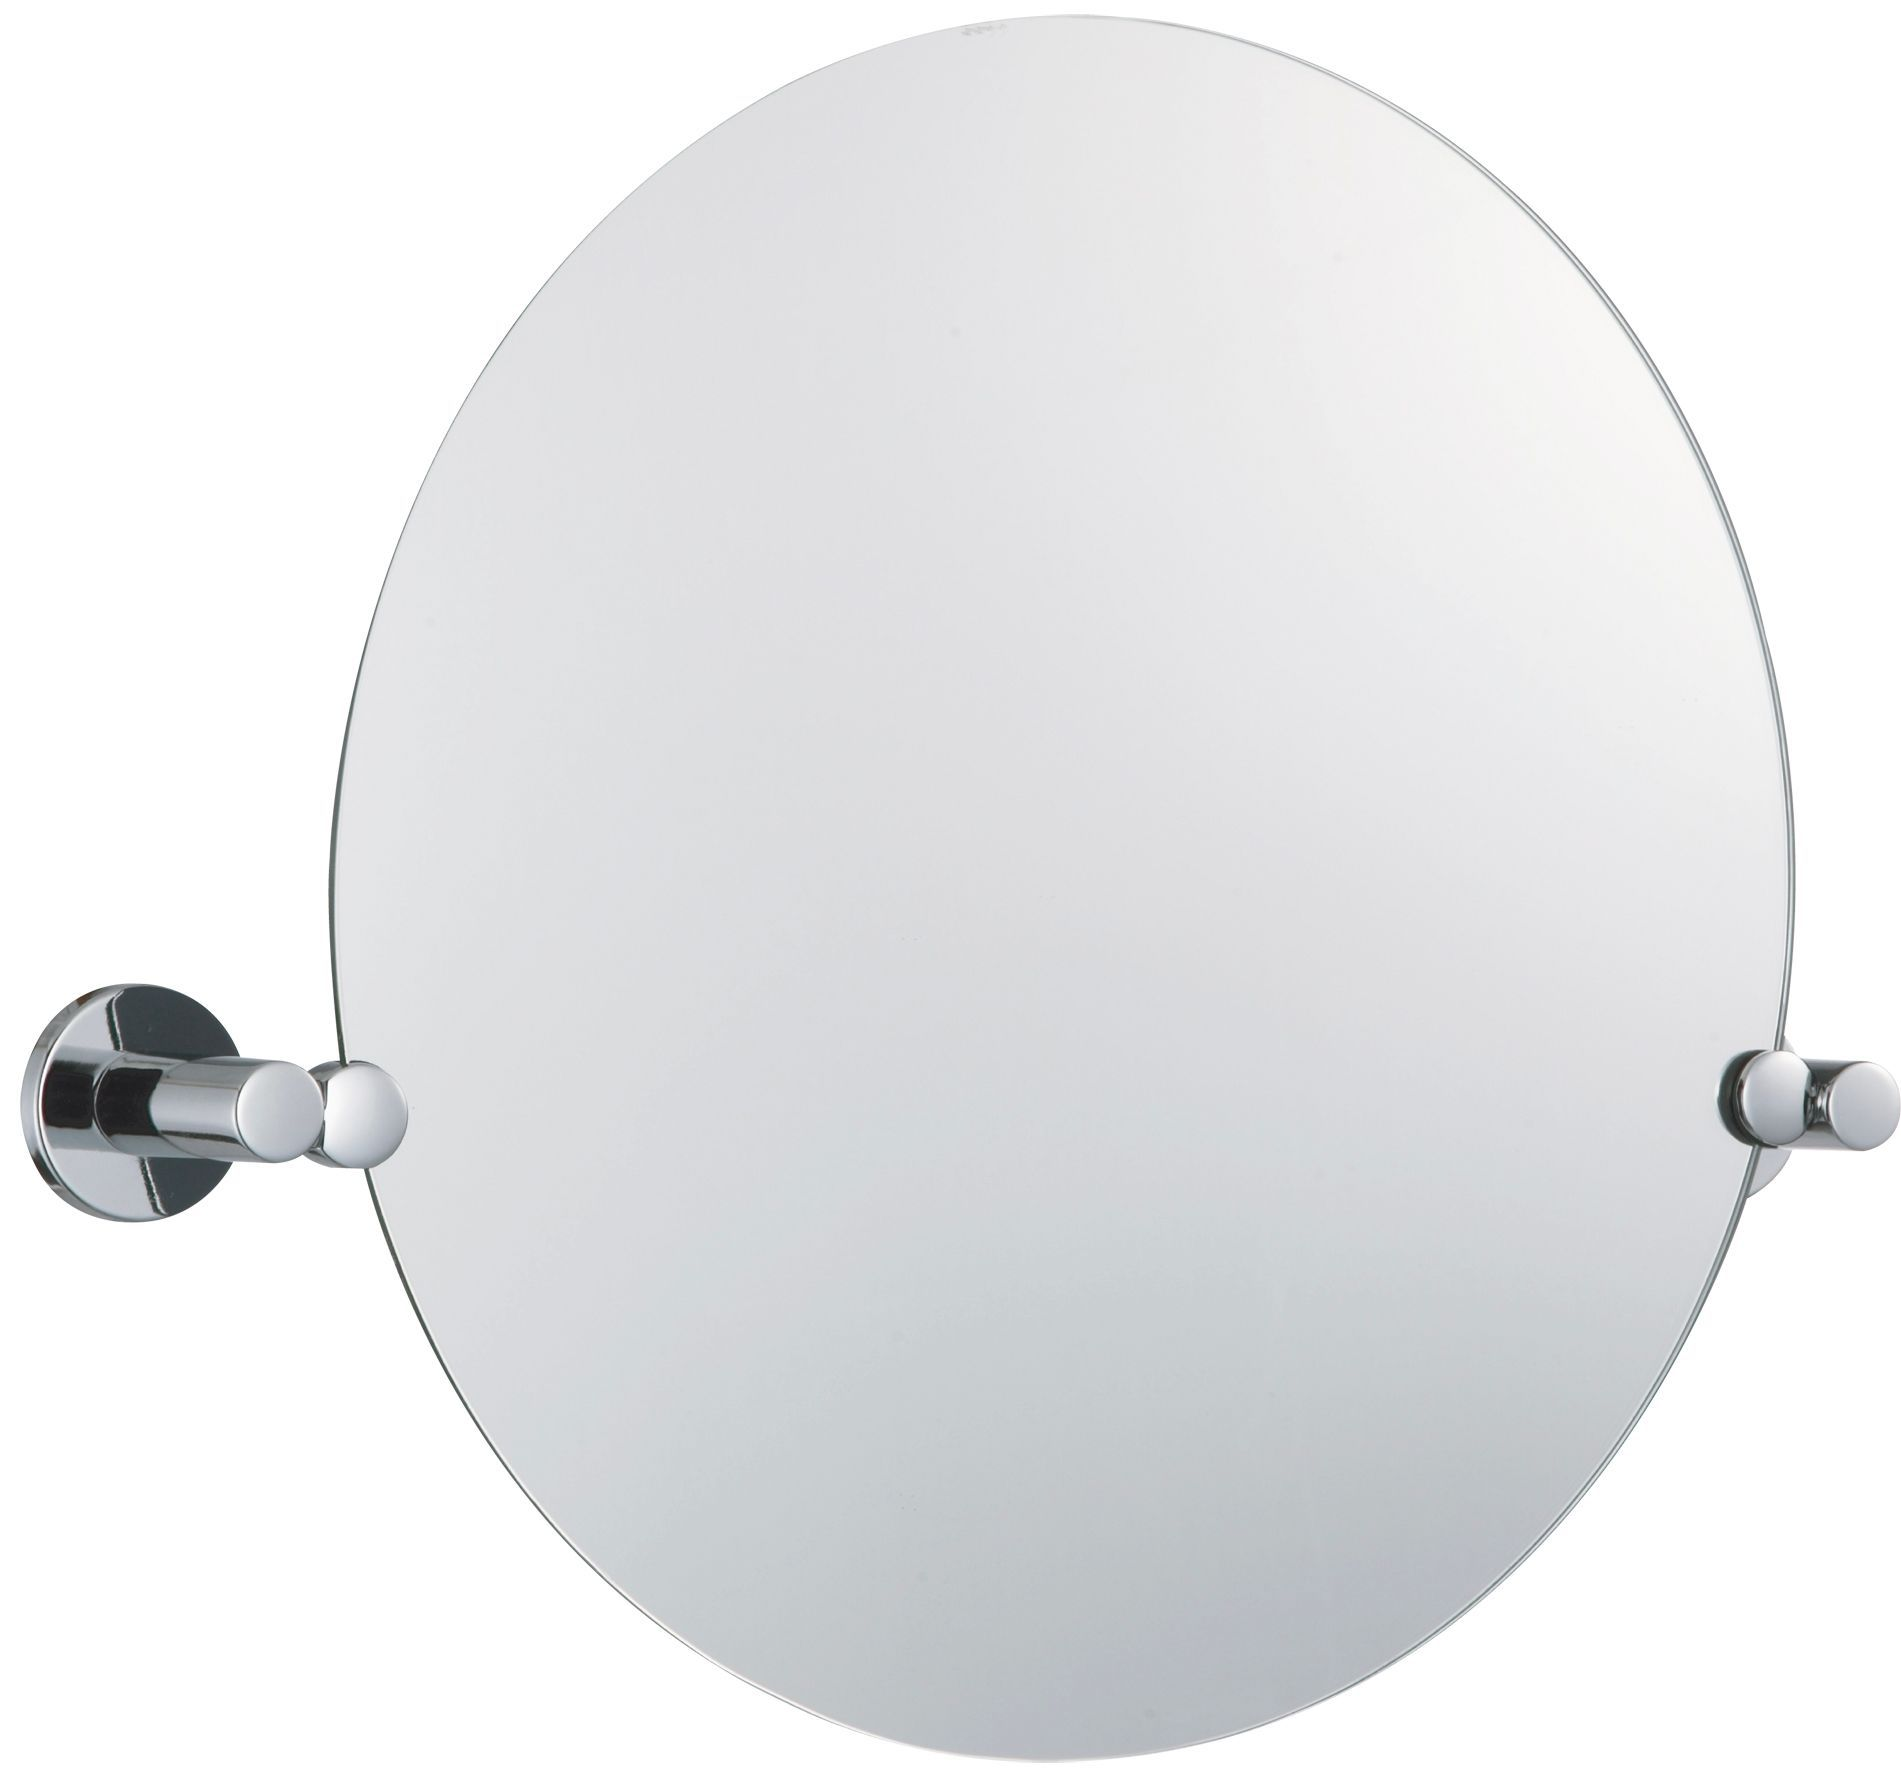 B&Q Cirque Circular Wall Mirror (W)450mm (H)550mm | Departments ...